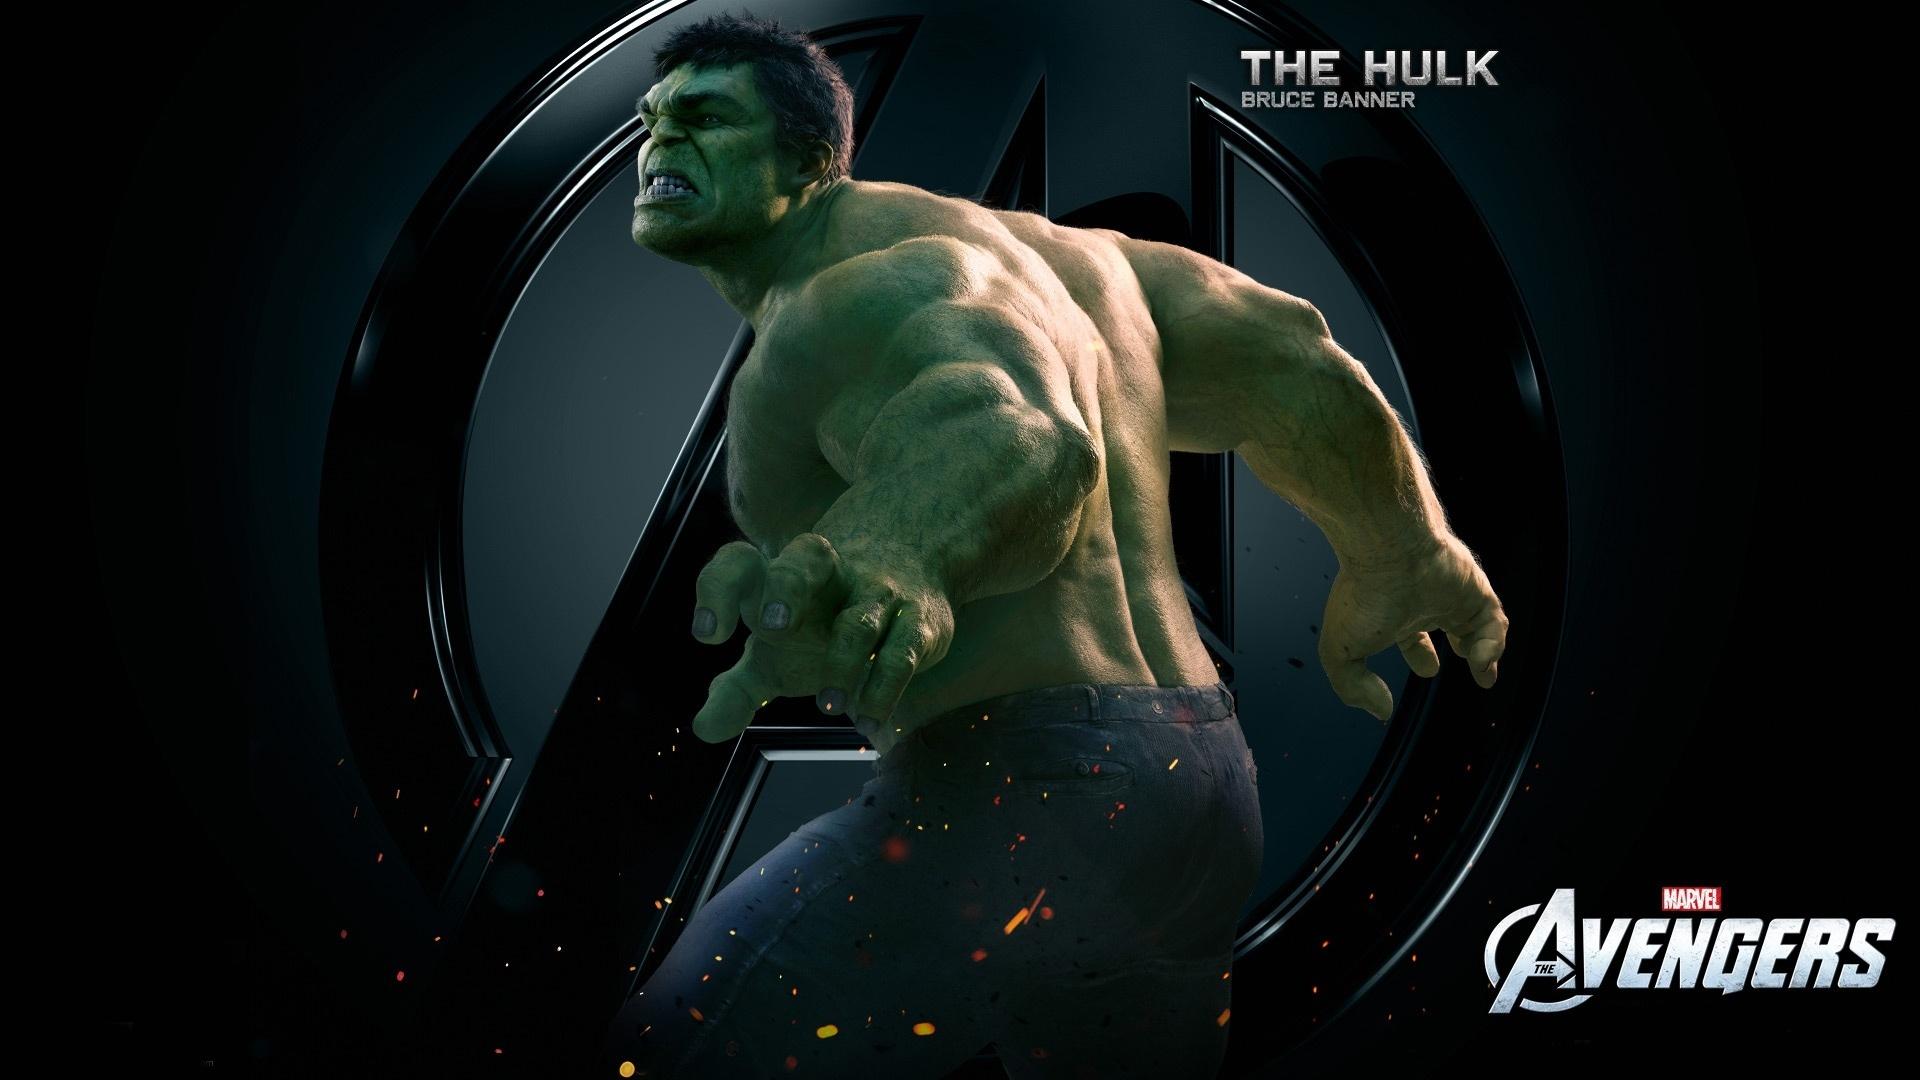 Images The Avengers (2012 film) Hulk hero film Movies